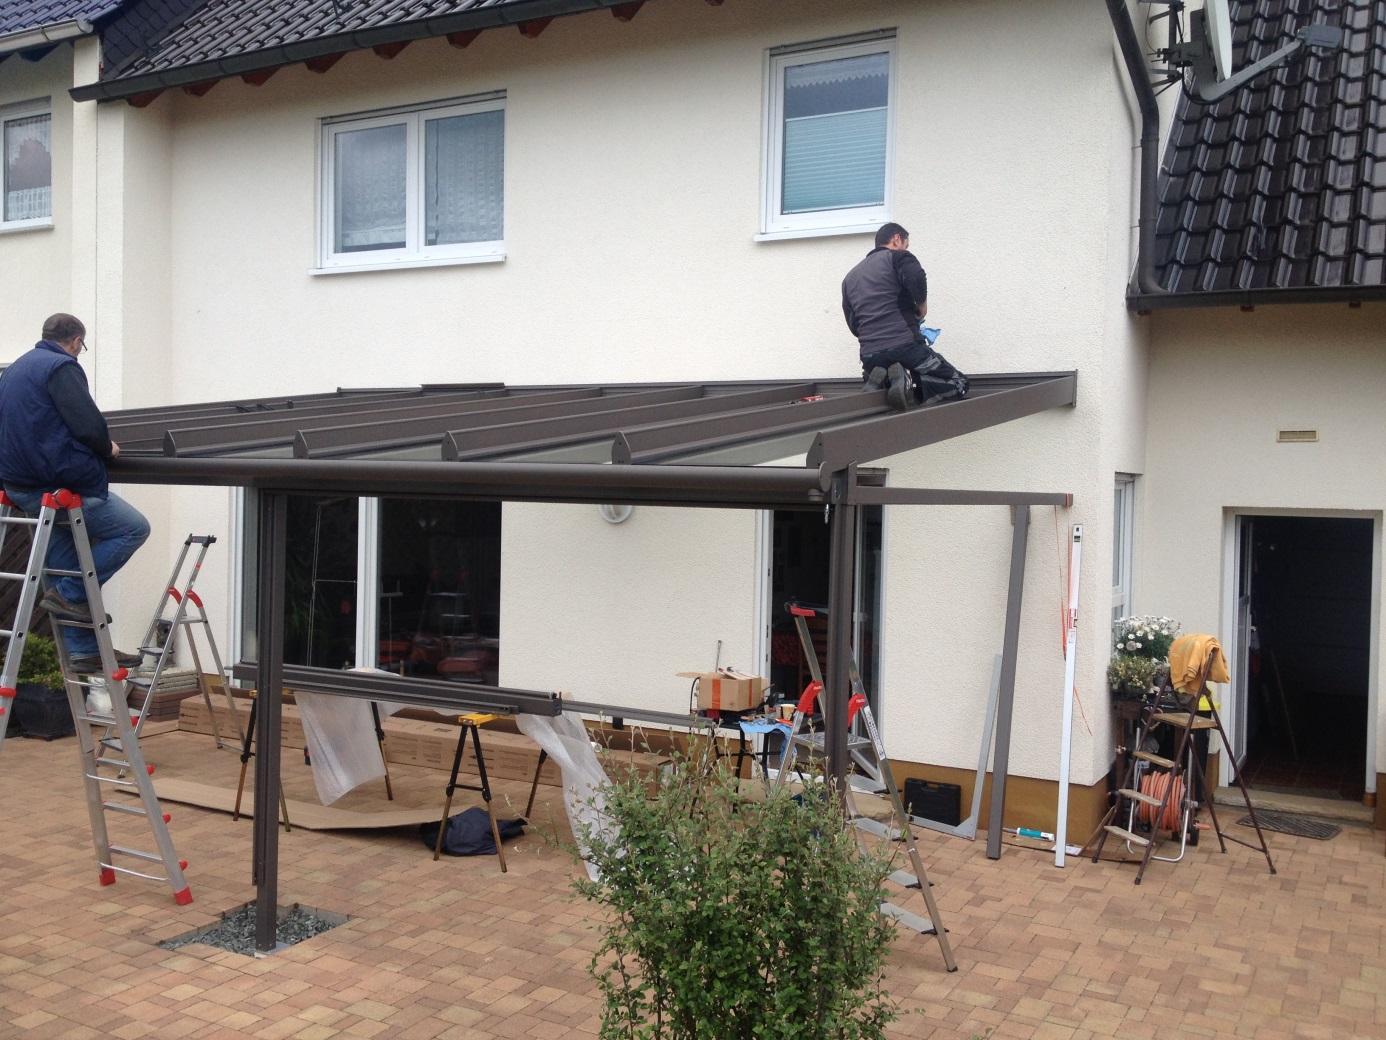 Terrassenüberdachung in Dillenburg – Manderbach: